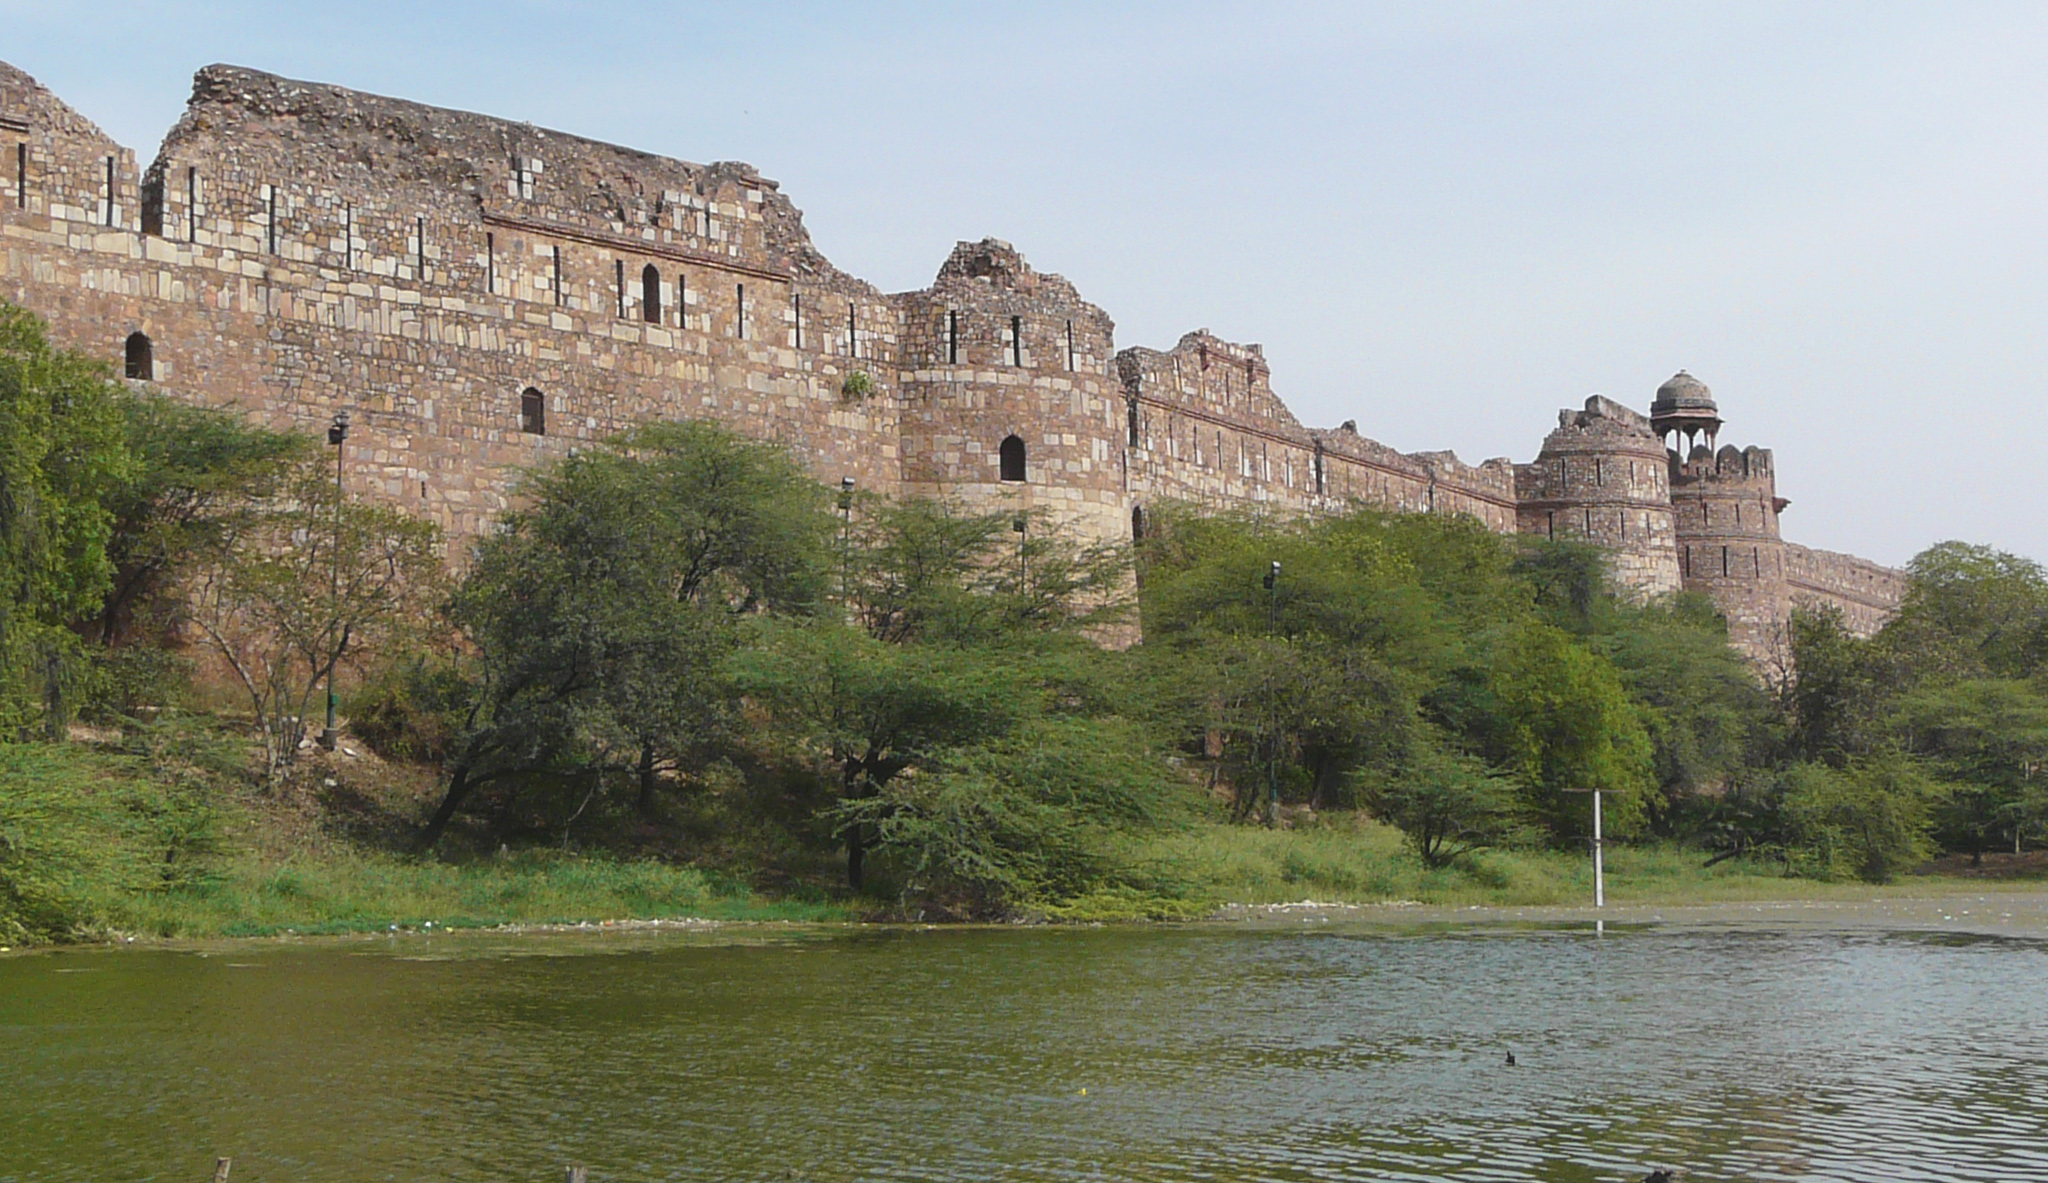 Purana_Qila_ramparts,_Delhi.jpg